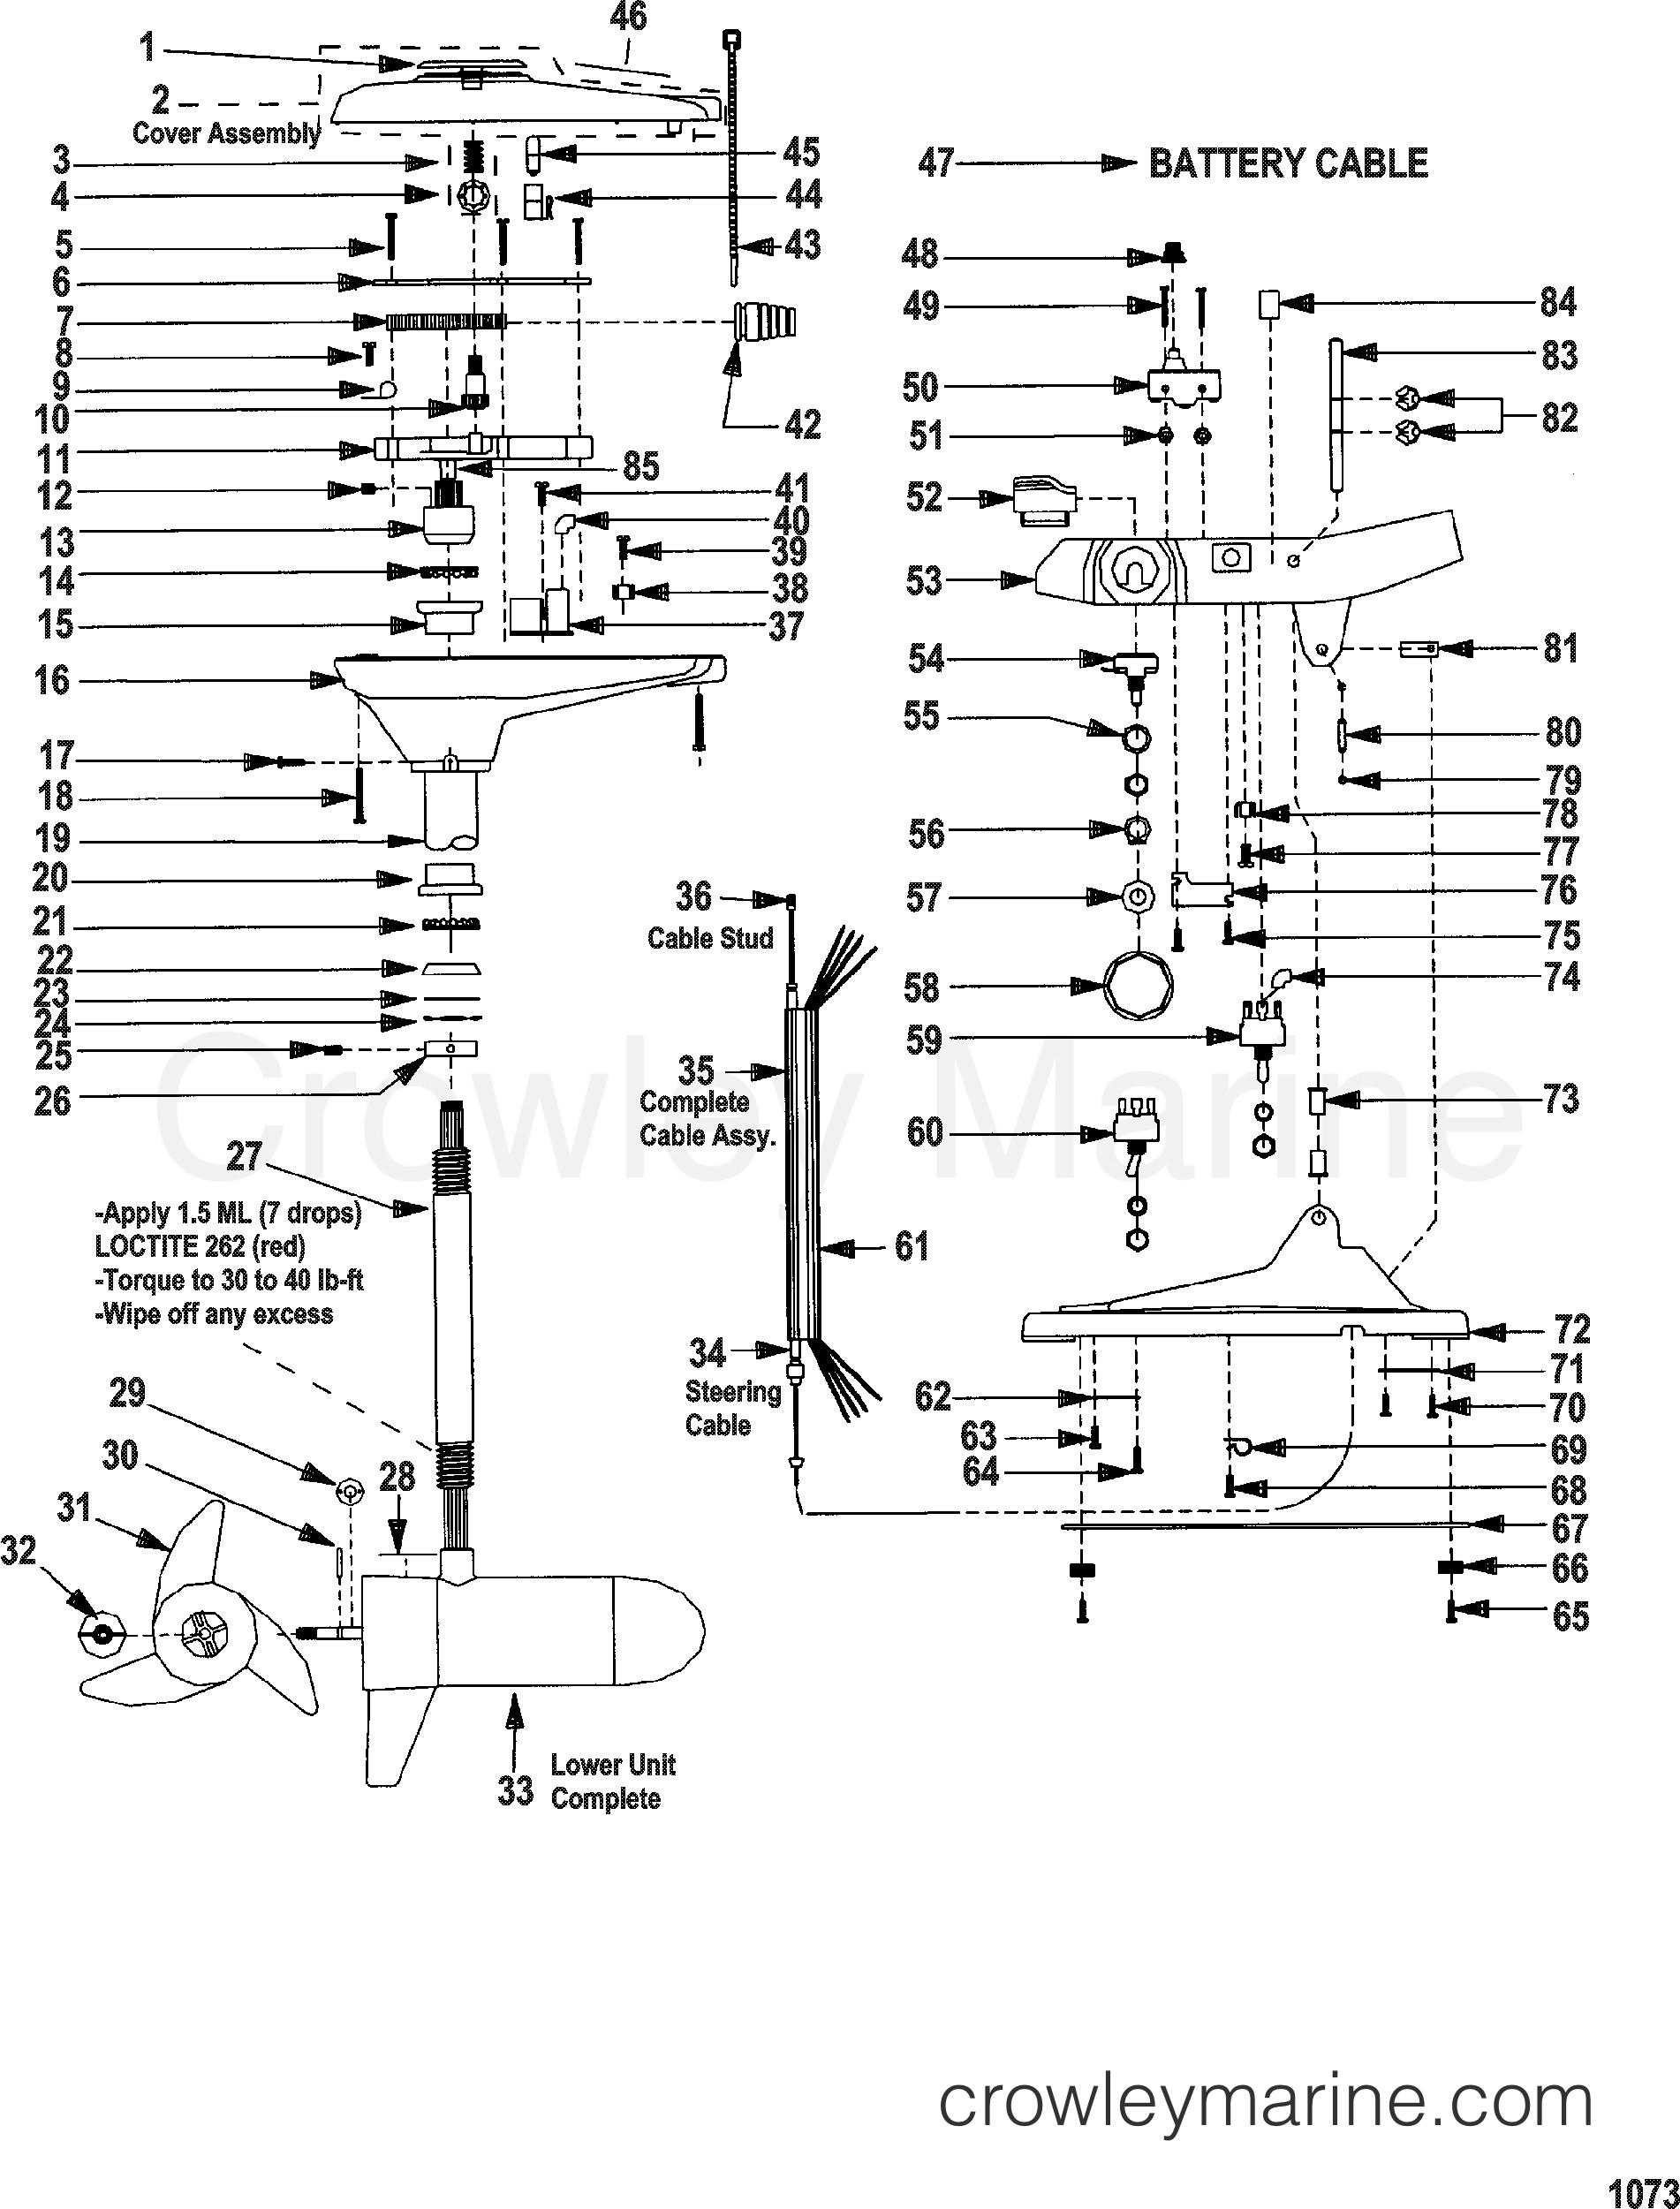 Marathon motors wiring diagram marathon xri motor wiring diagram marathon motors wiring diagram marathon xri motor wiring diagram album wire collection asfbconference2016 Choice Image